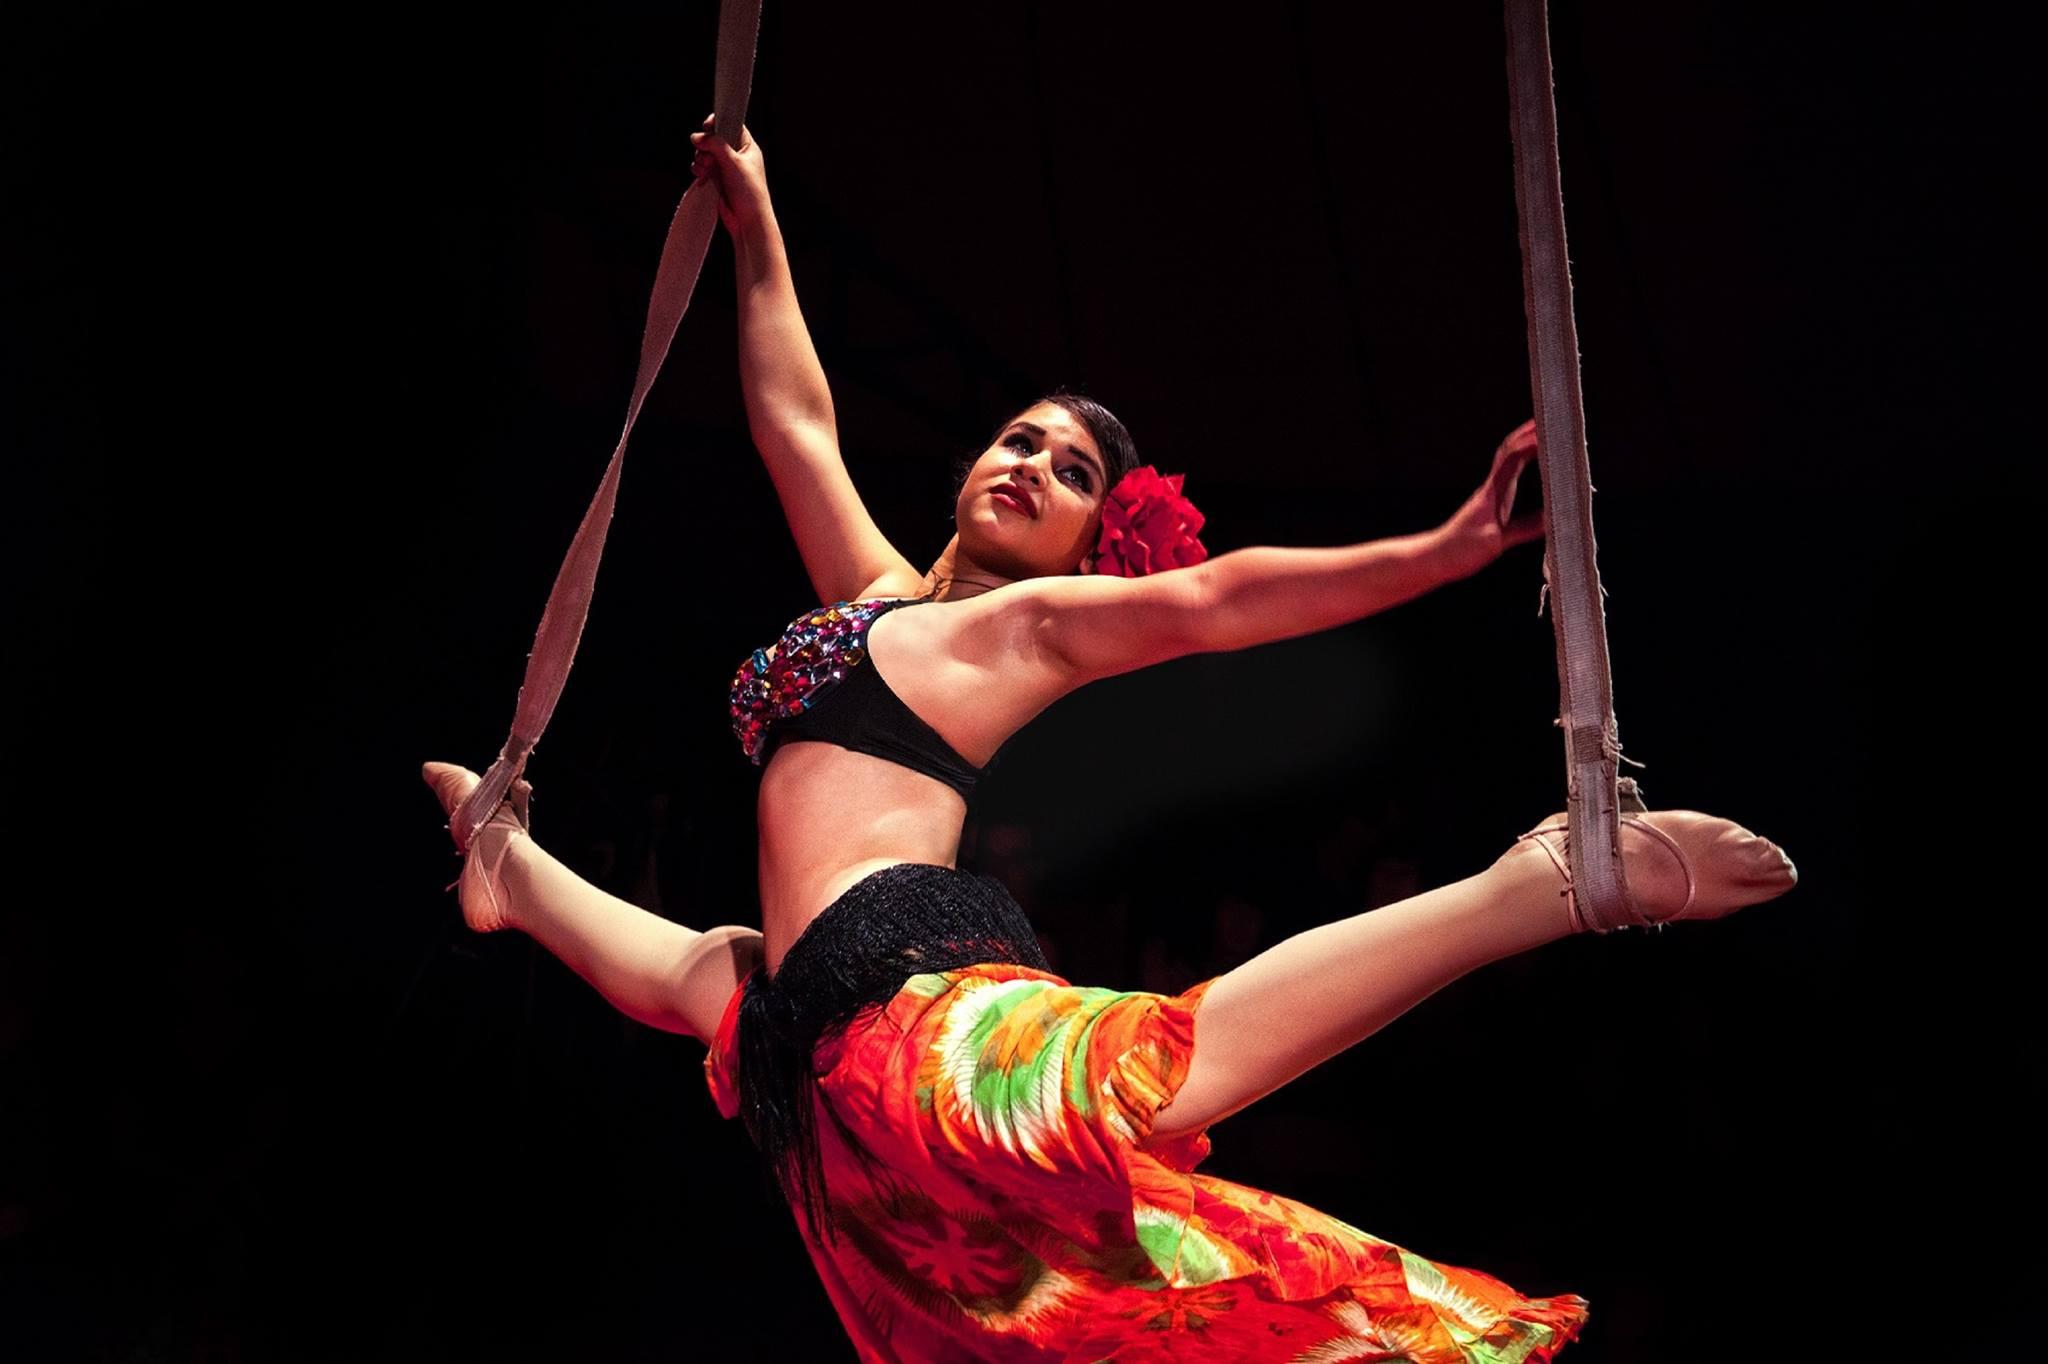 Fille dans le cirque nitro